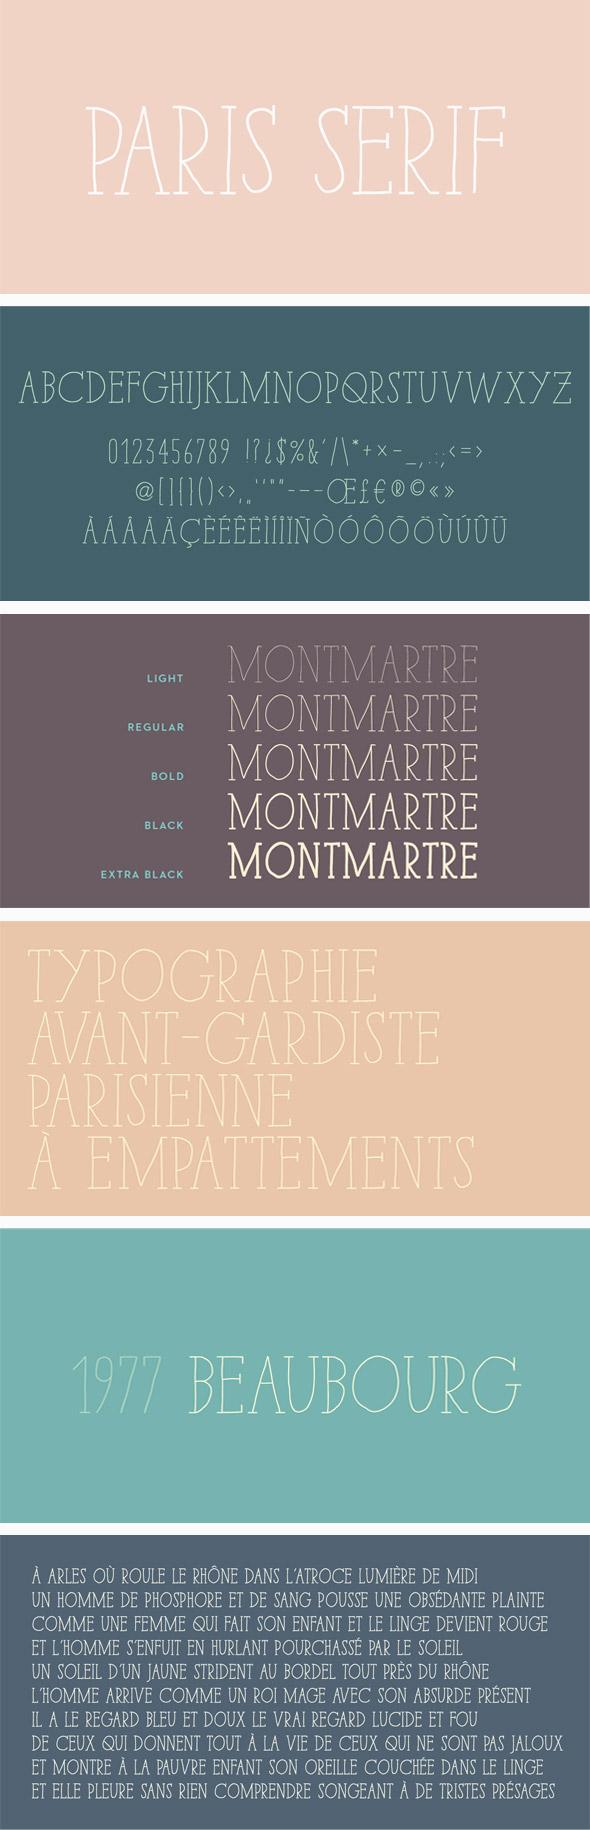 Paris Serif Font Pack - Hand-writing Script